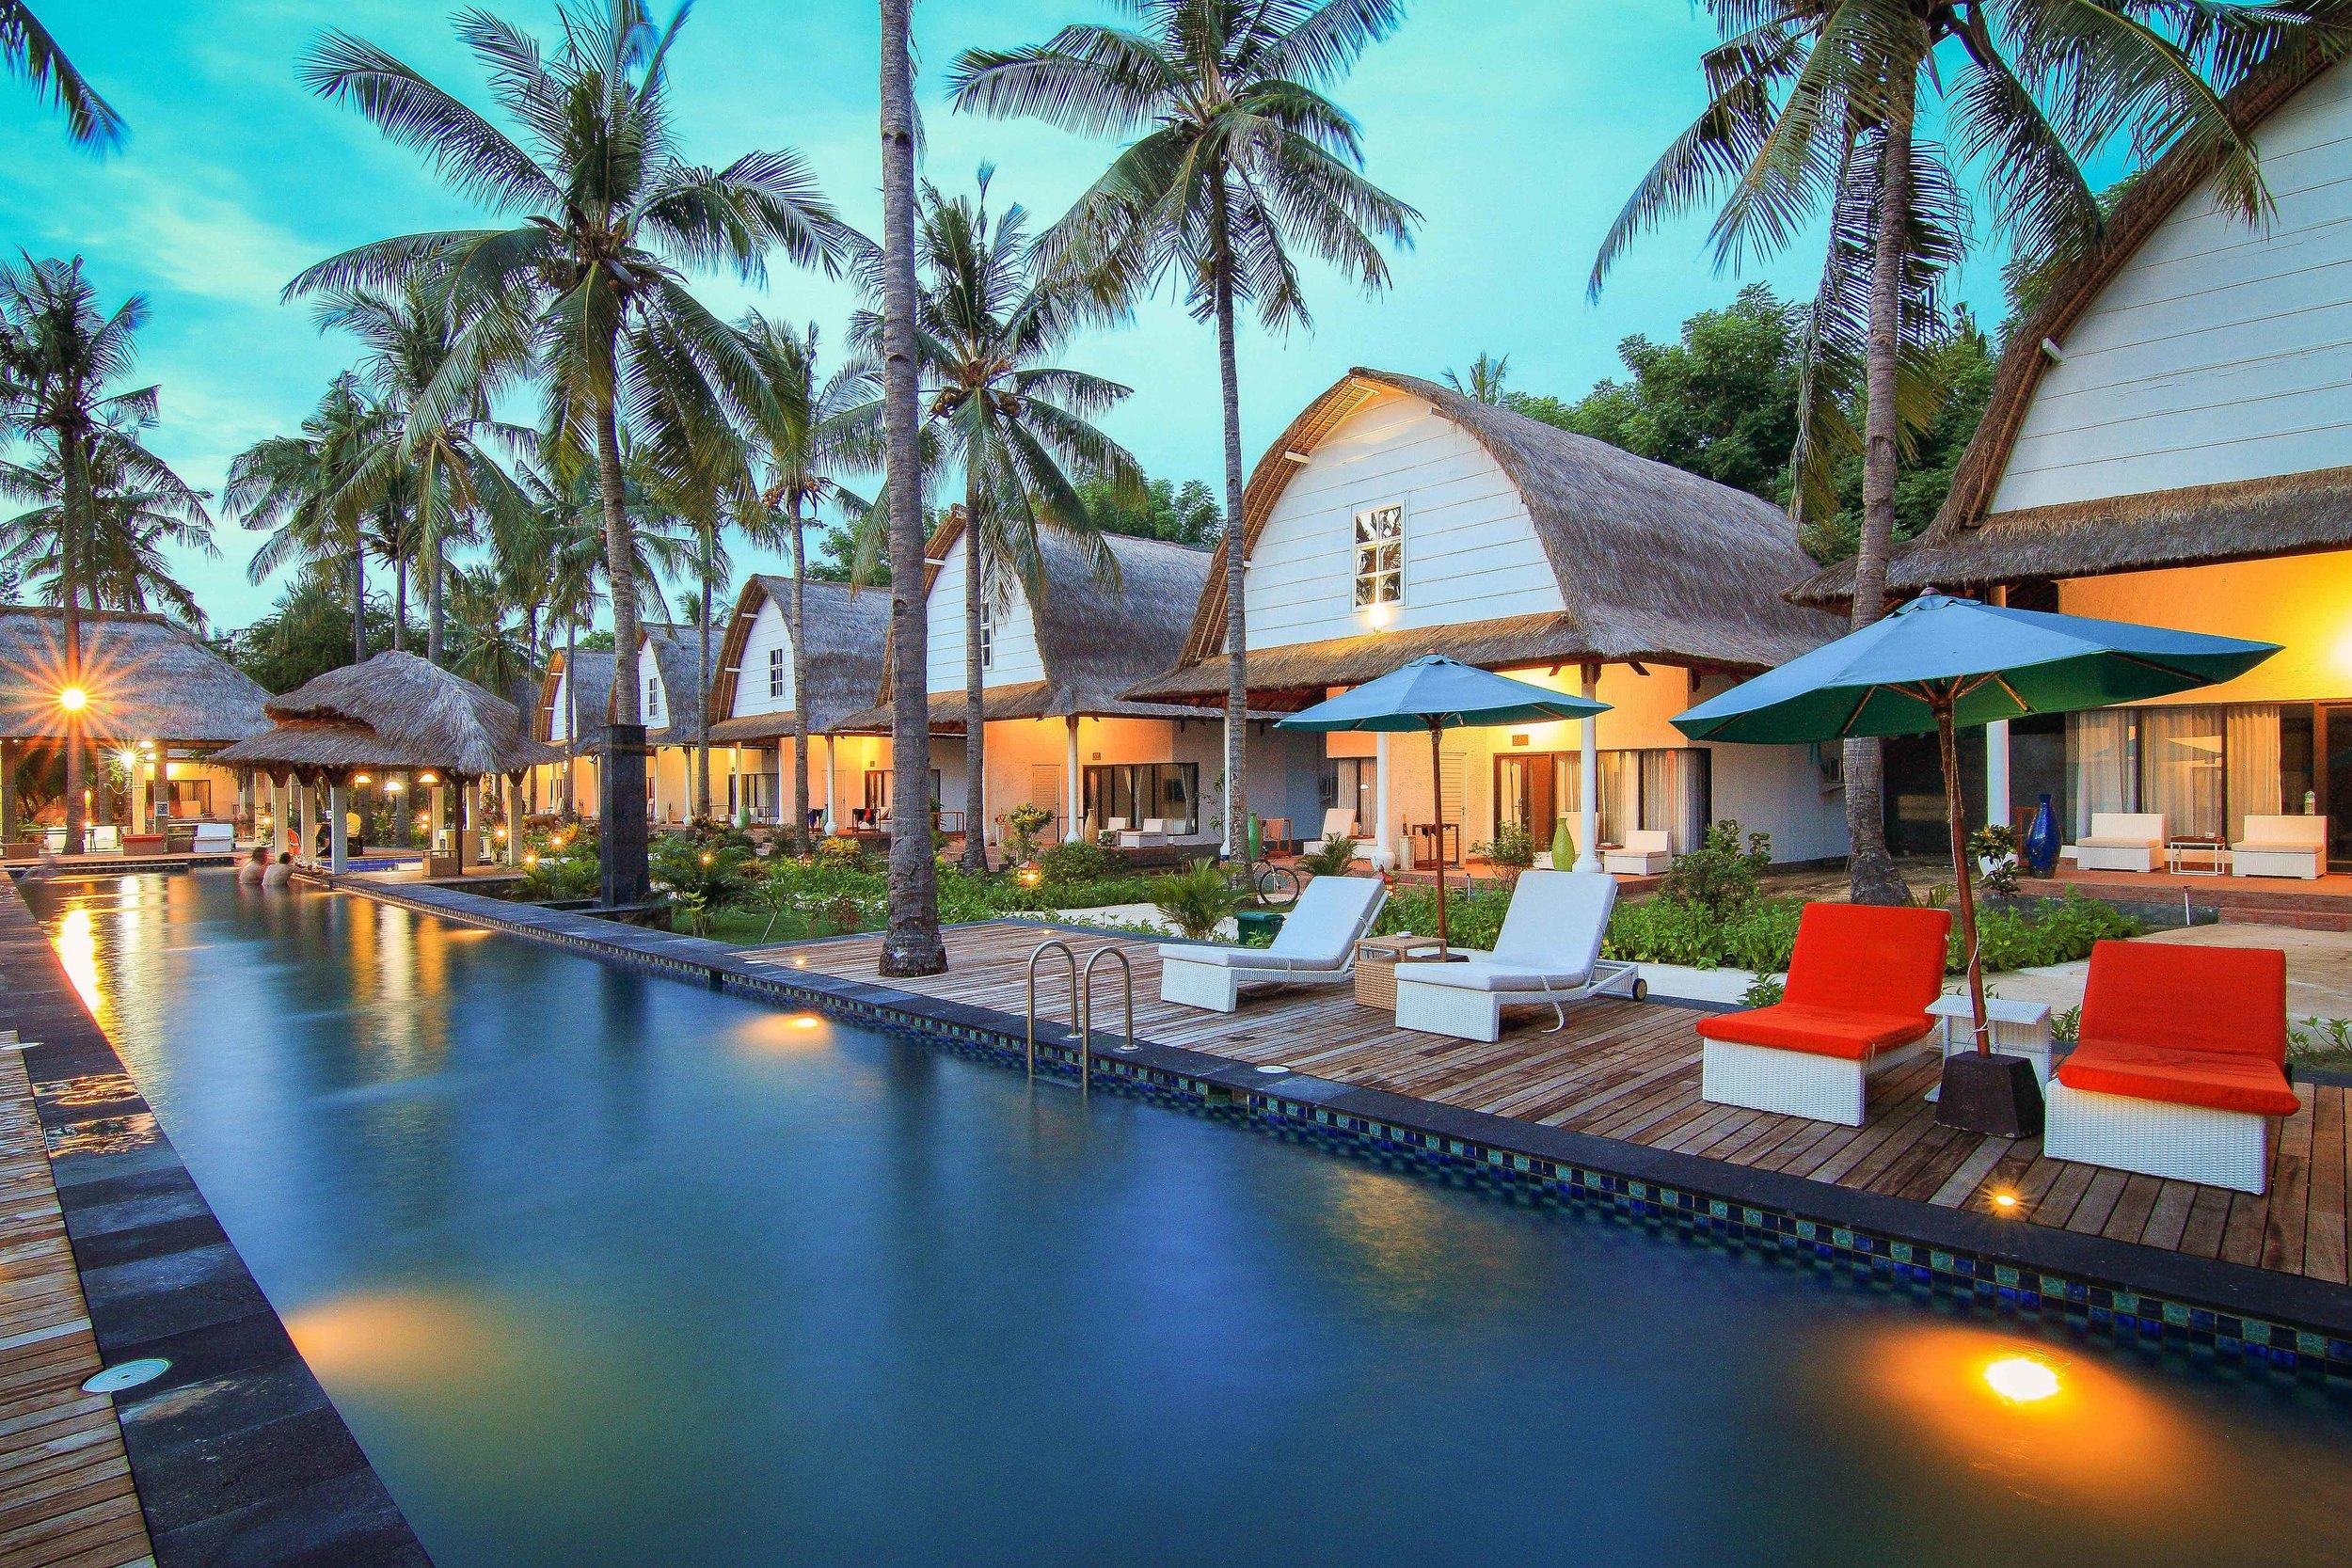 Jambuluwuk Oceano Resort Pool and Rooms Night View.jpg